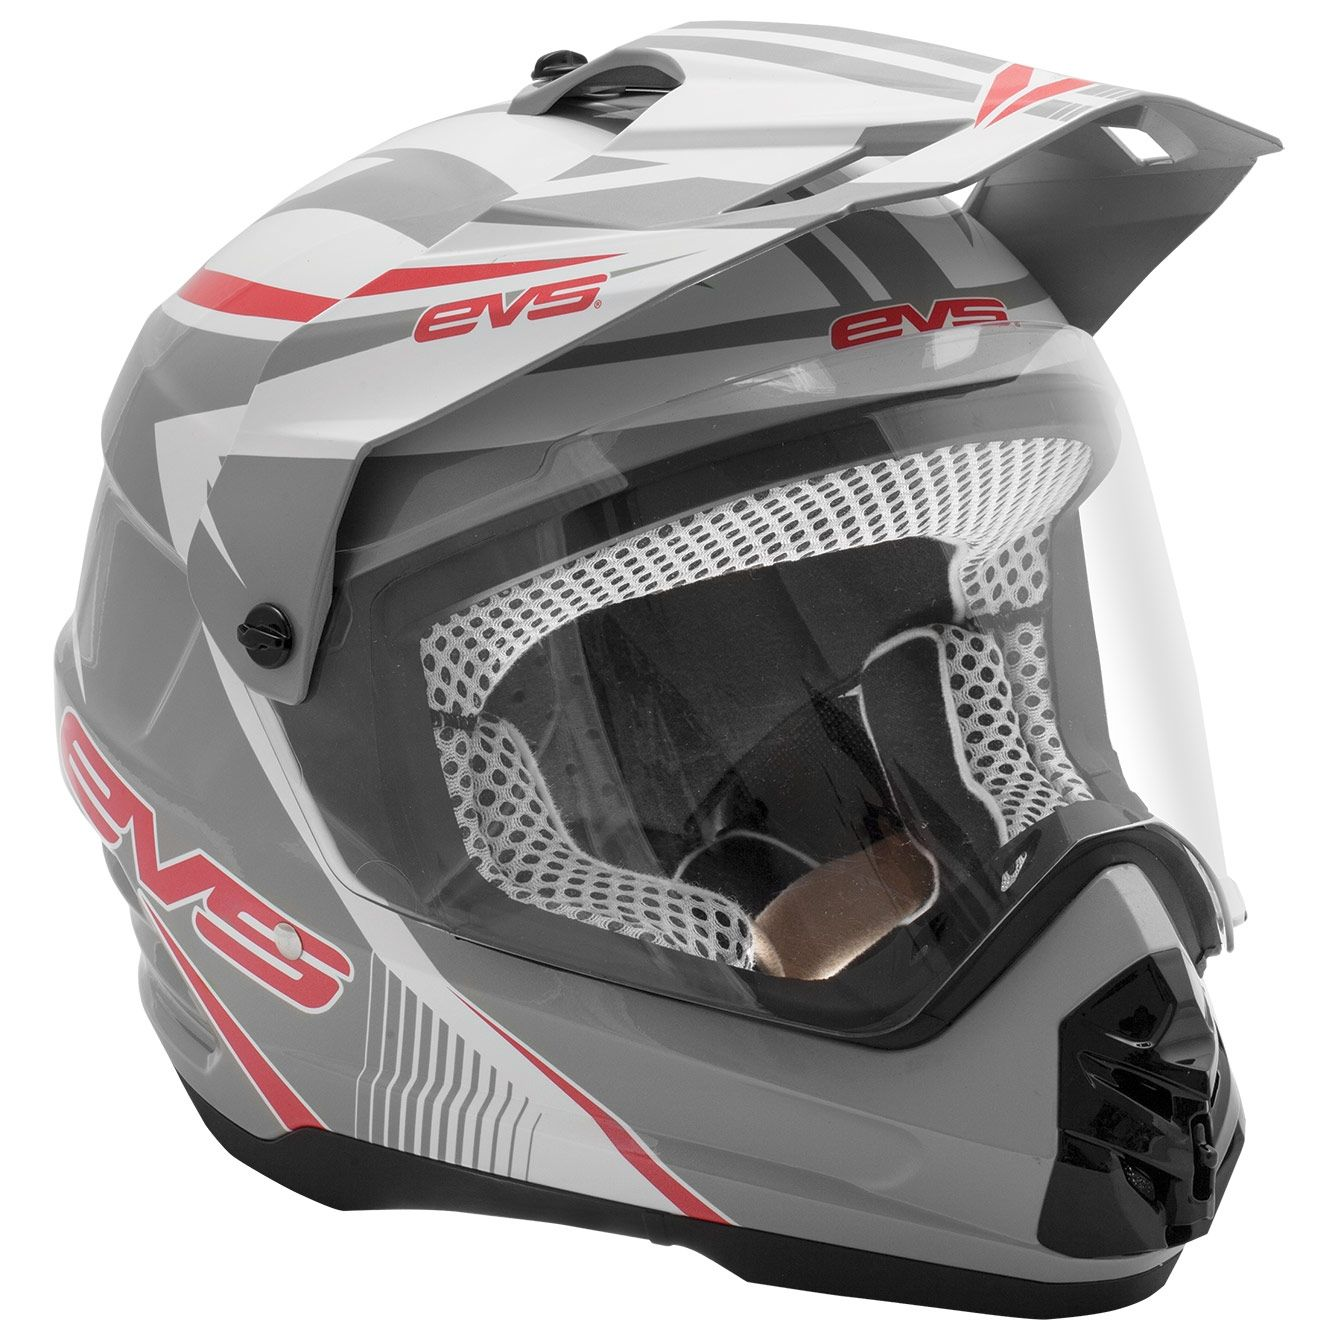 Venture Graphic Helmets Moto Dual Sport Motorcycle Dual Sport Dual Sport Helmet